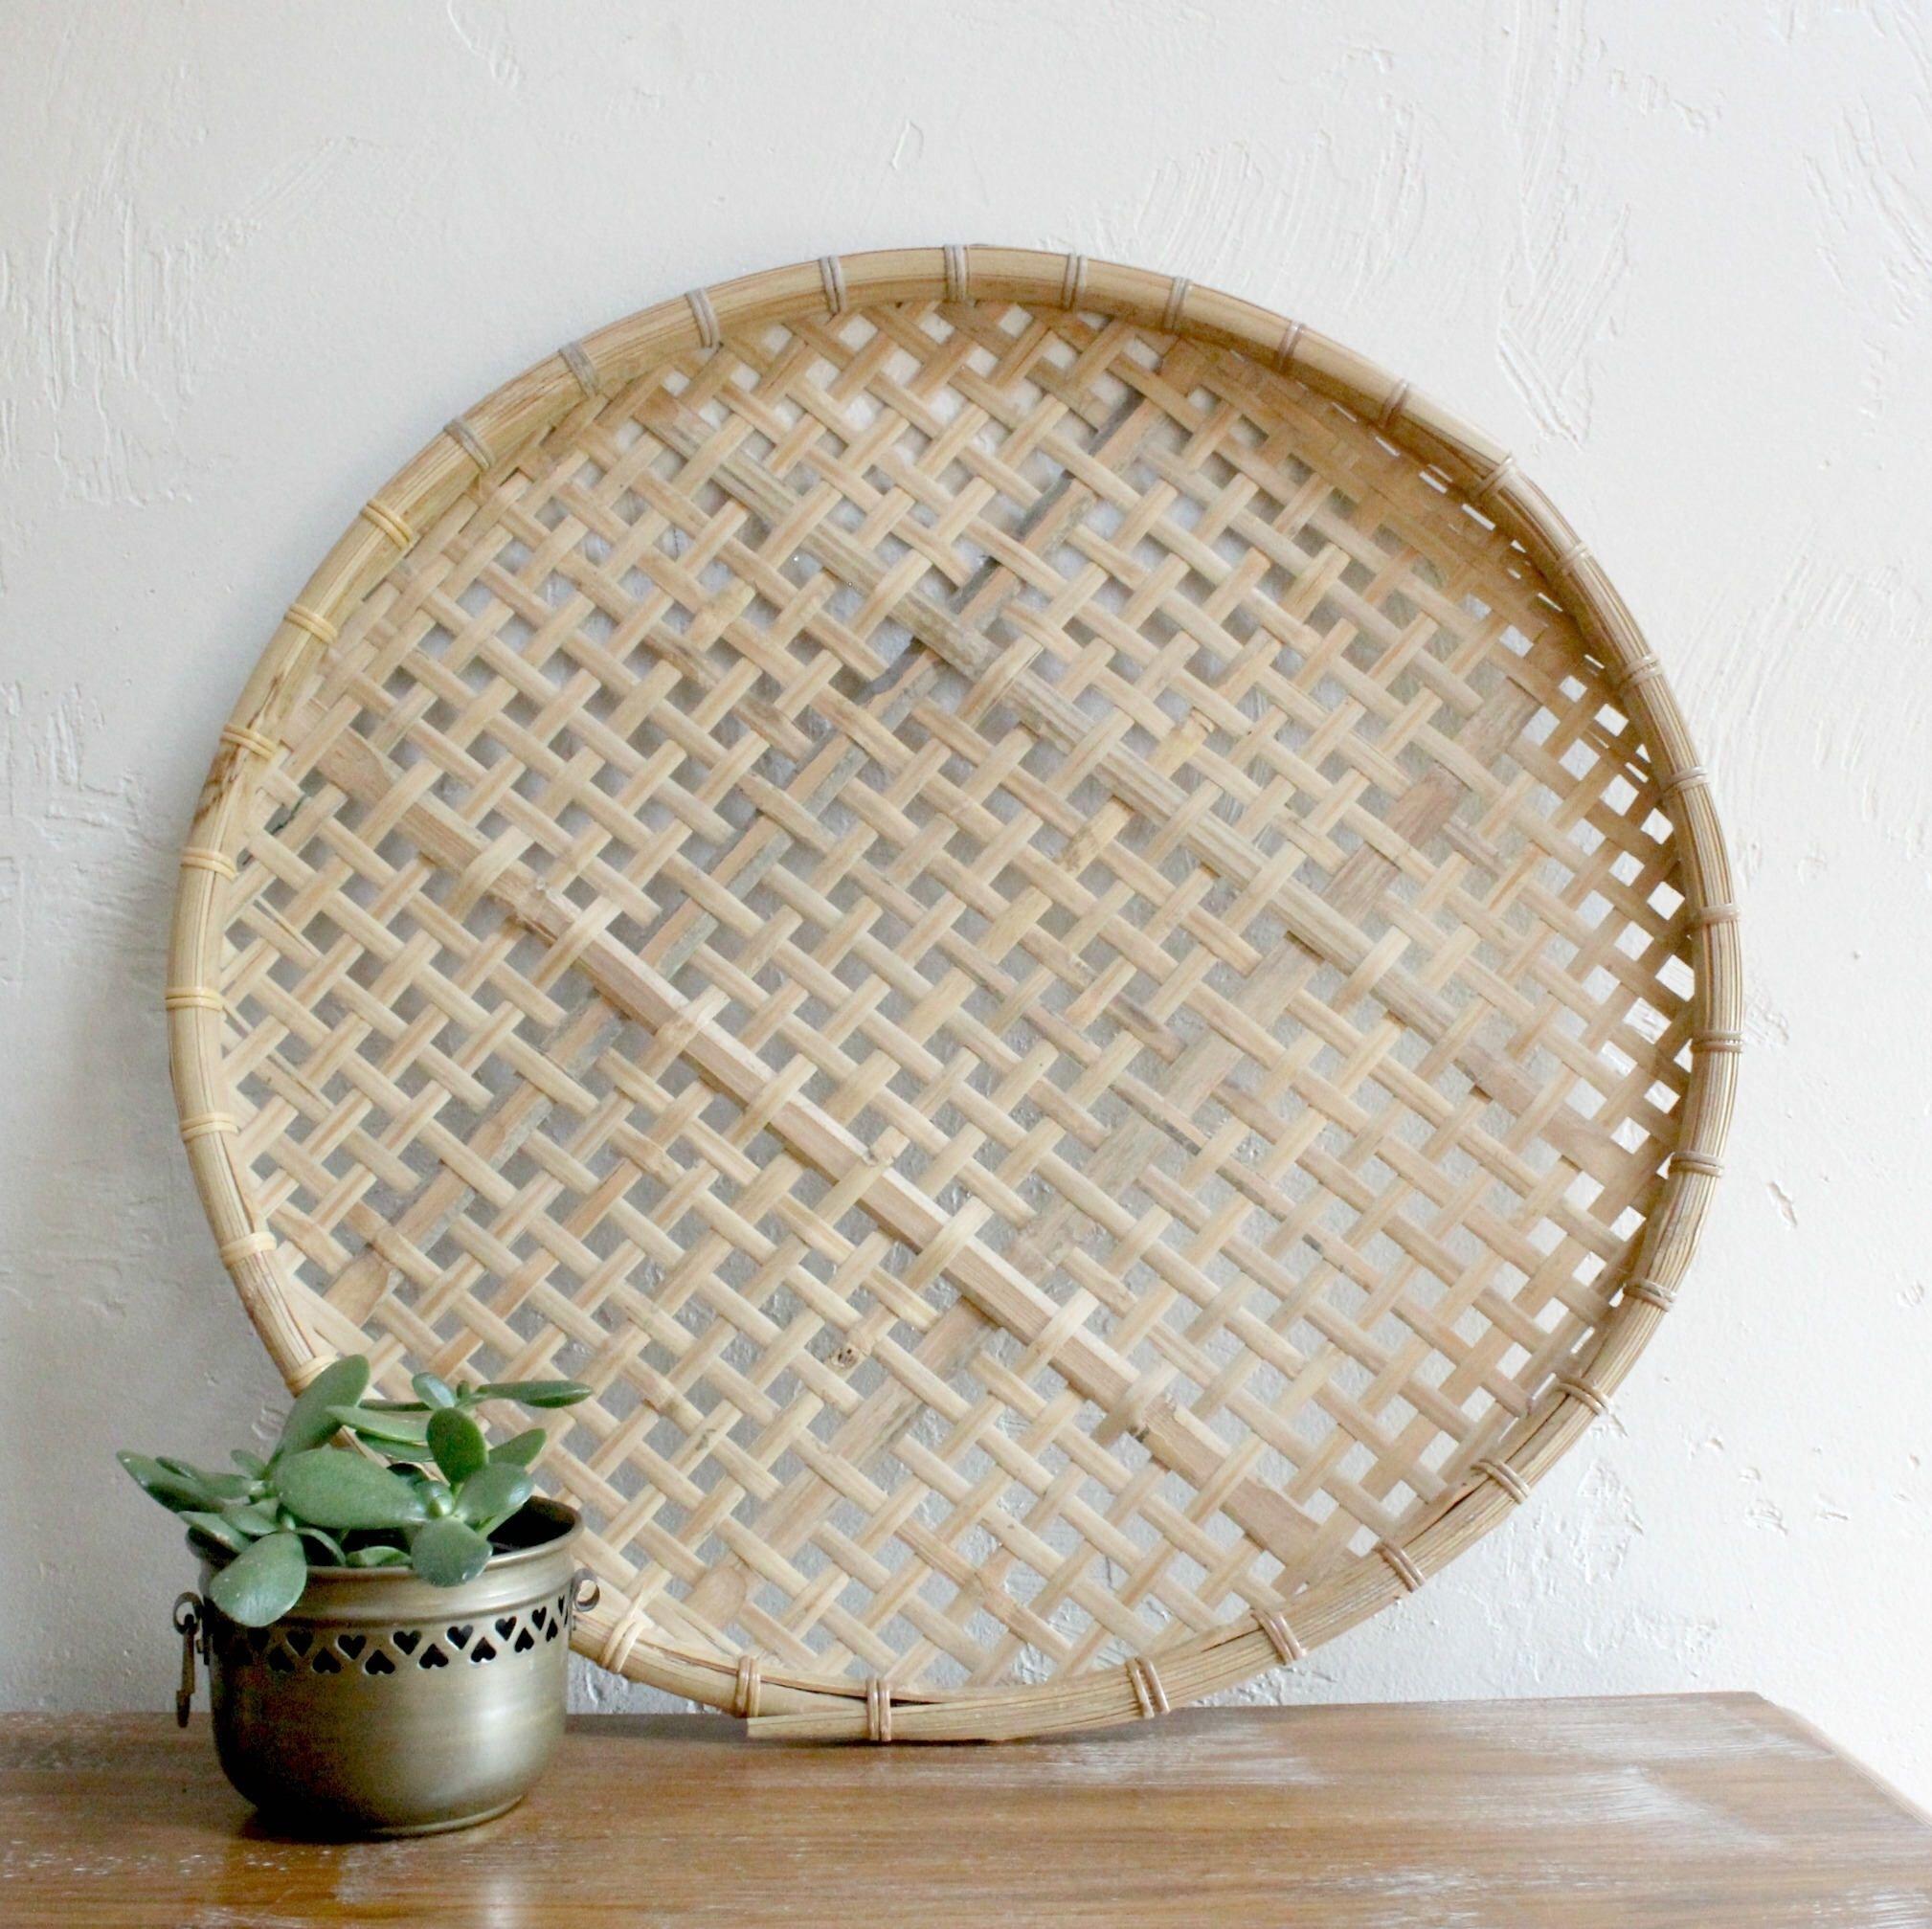 Large Flat Woven Wall Basket Bamboo Basket Large Basket Tray Wall With 2018 Woven Basket Wall Art (View 11 of 20)